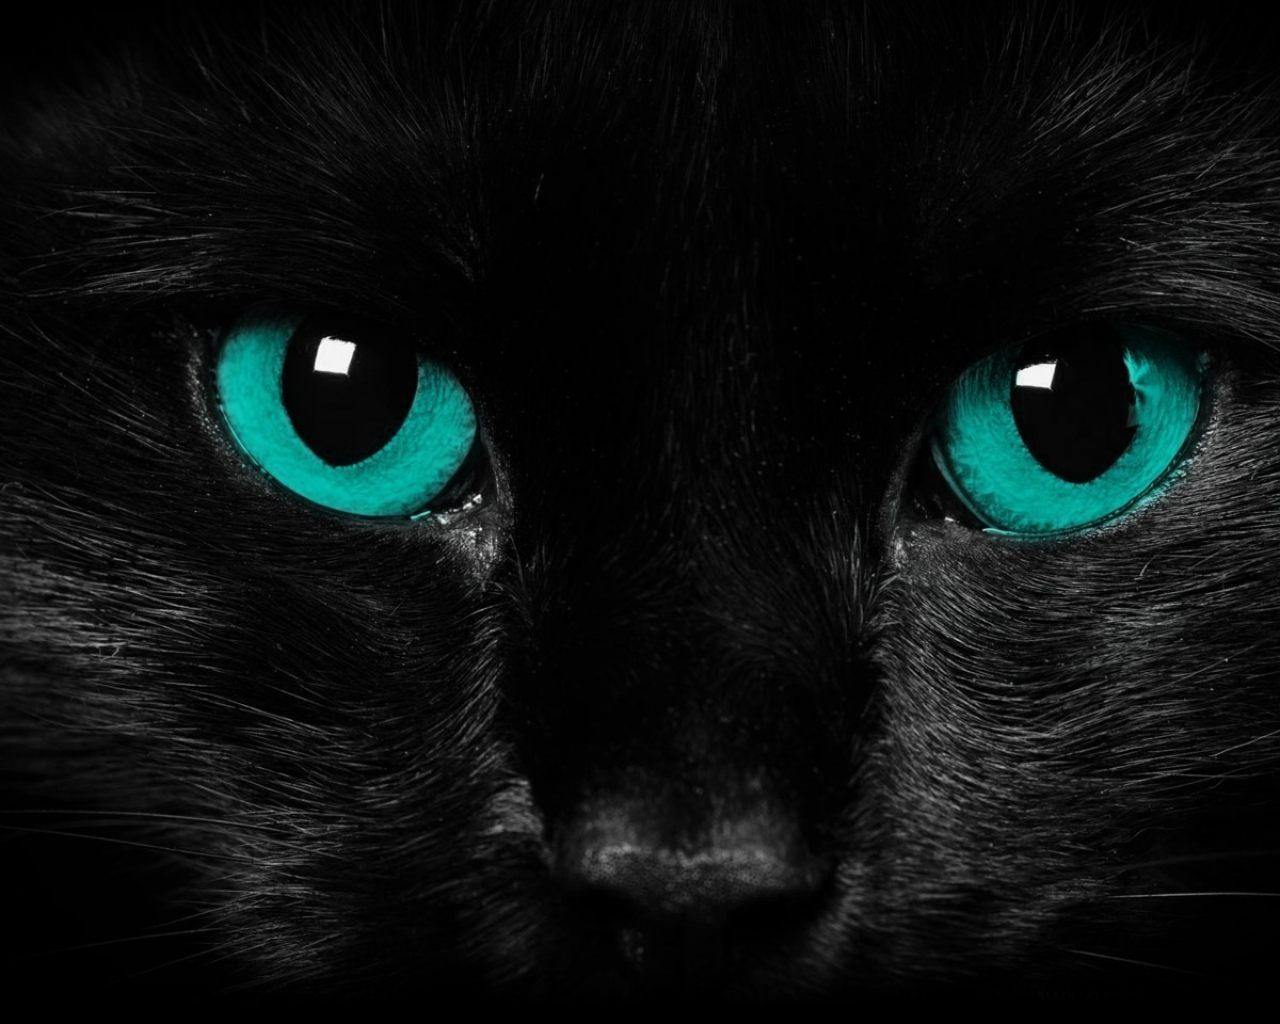 Black Cat With Pink Scary Eyes: 1280x1024 :: Fondos De Pantalla Y Wallpapers